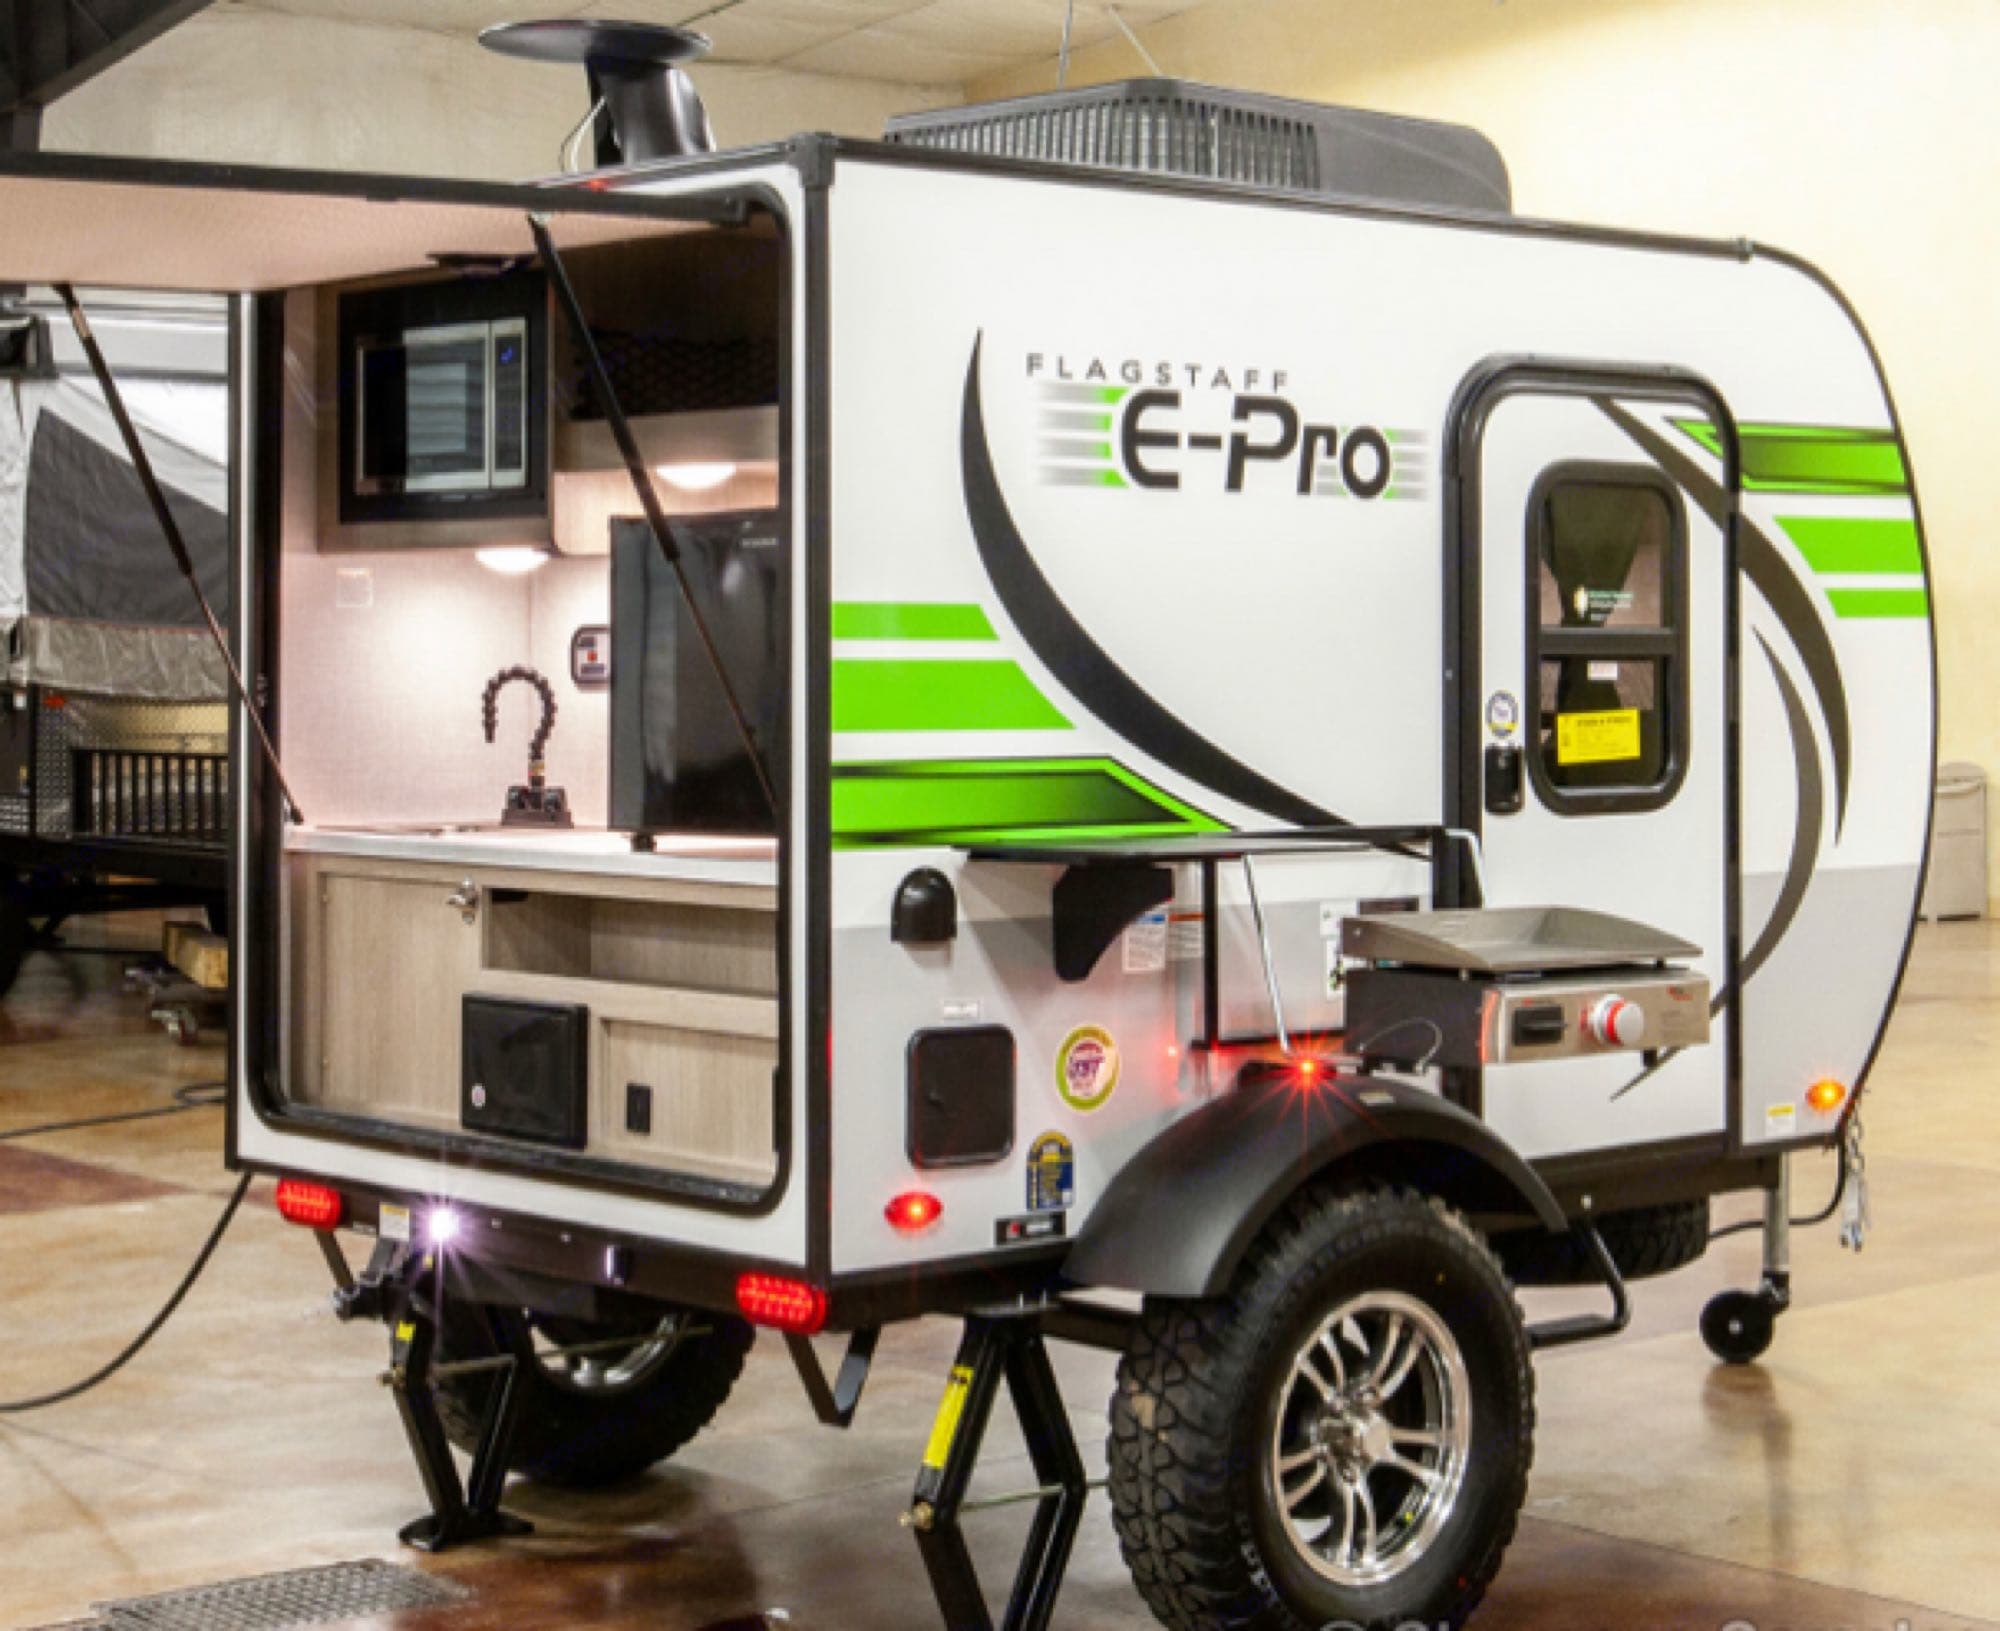 Flagstaff Micro Lite 2021